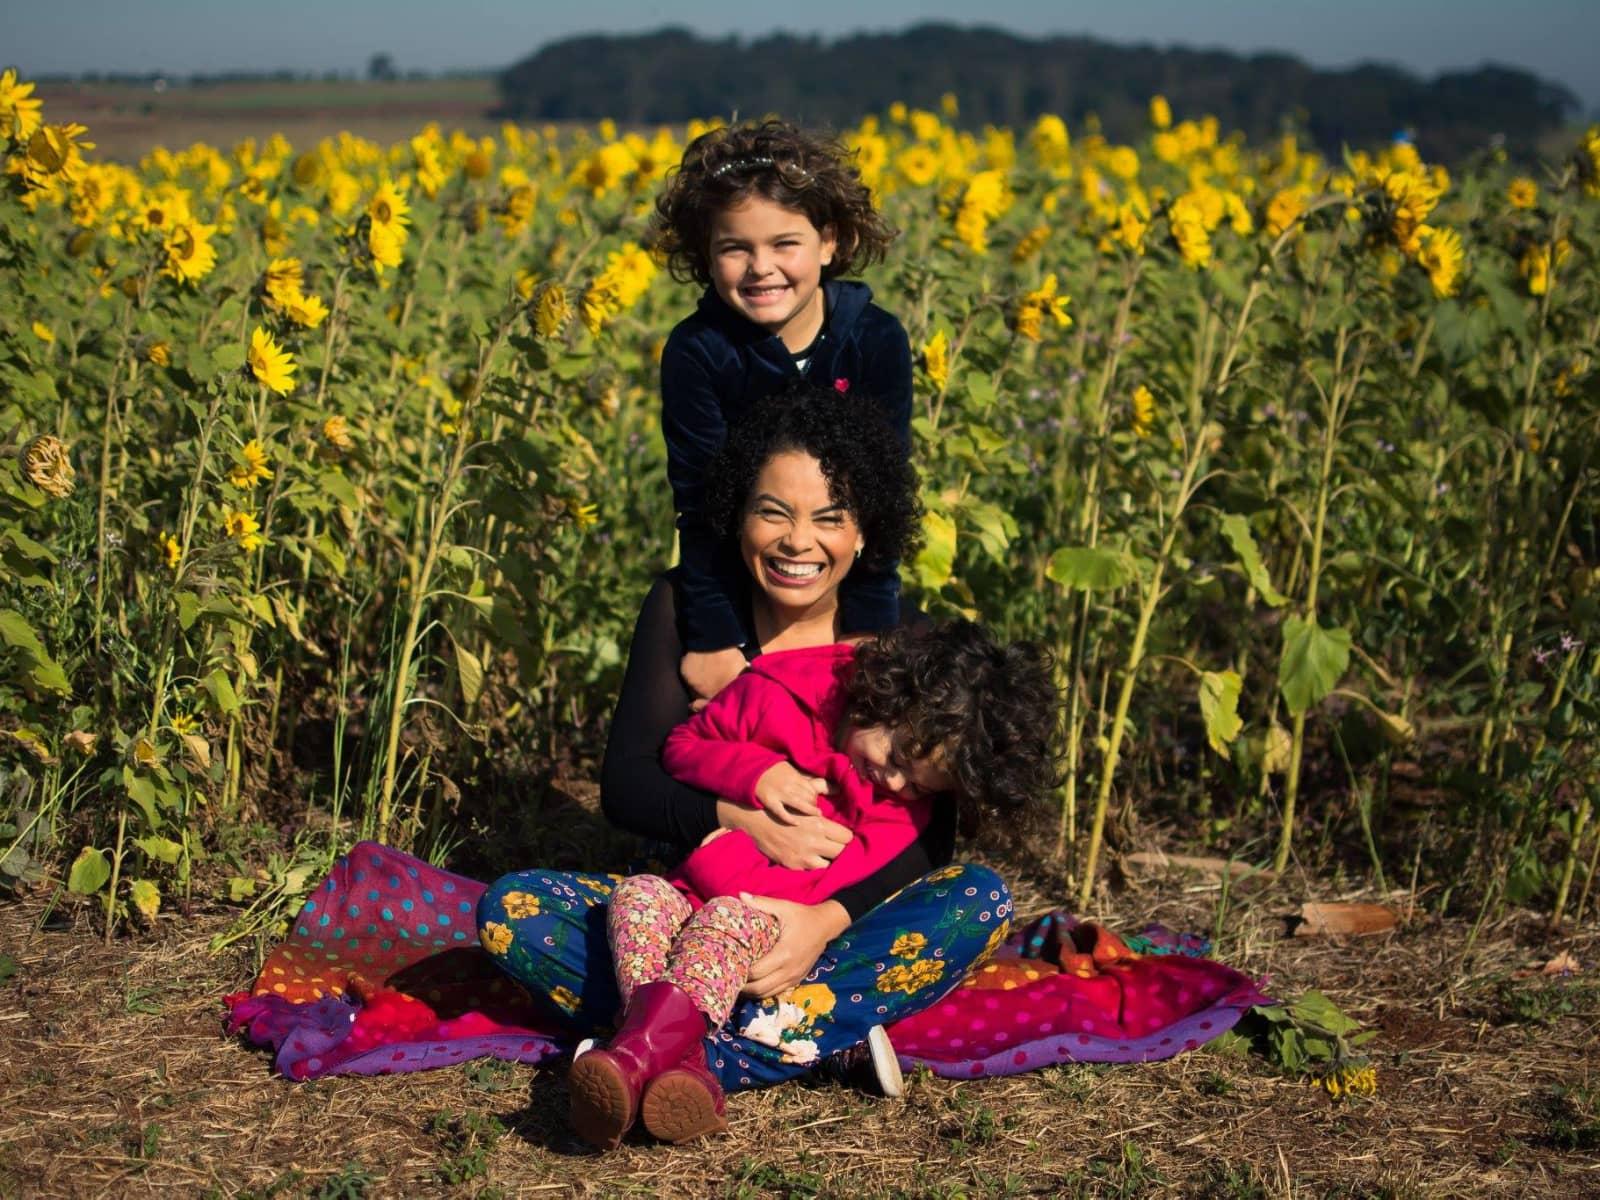 Ariadne & Ronaldo from Botucatu, Brazil